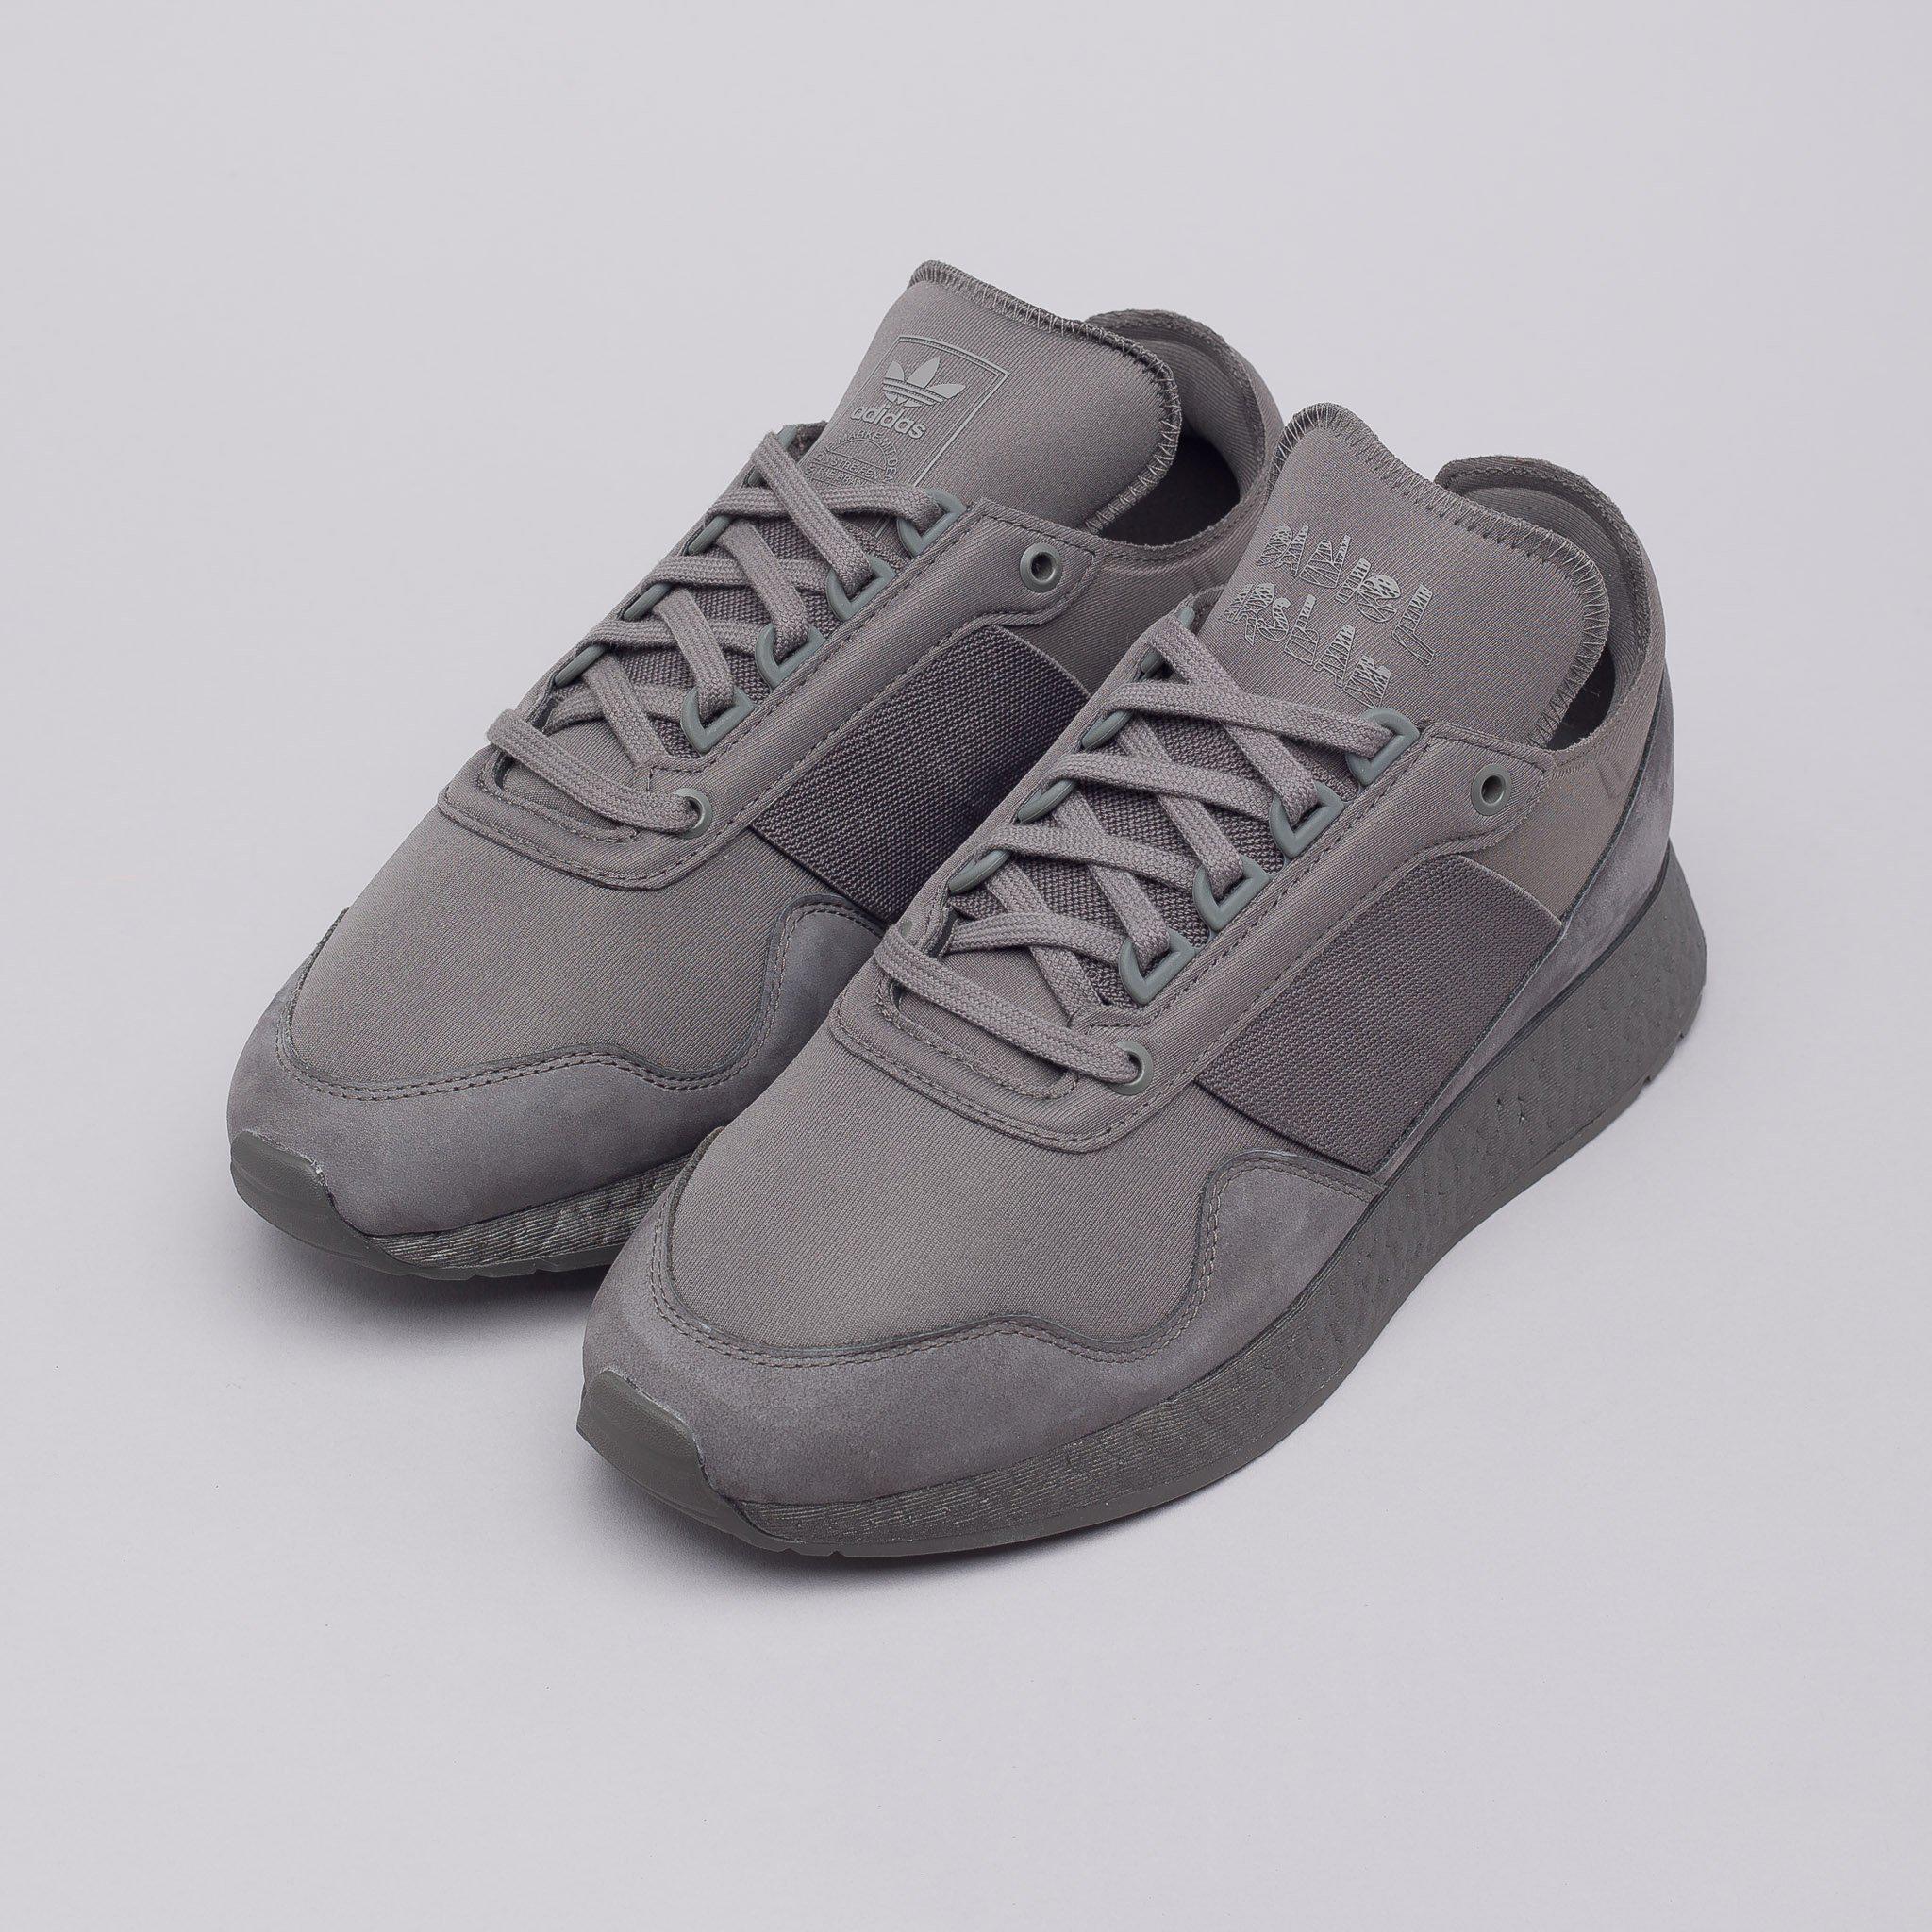 free shipping b1725 22619 adidas X Daniel Arsham New York Present In Grey in Gray for Men - Lyst